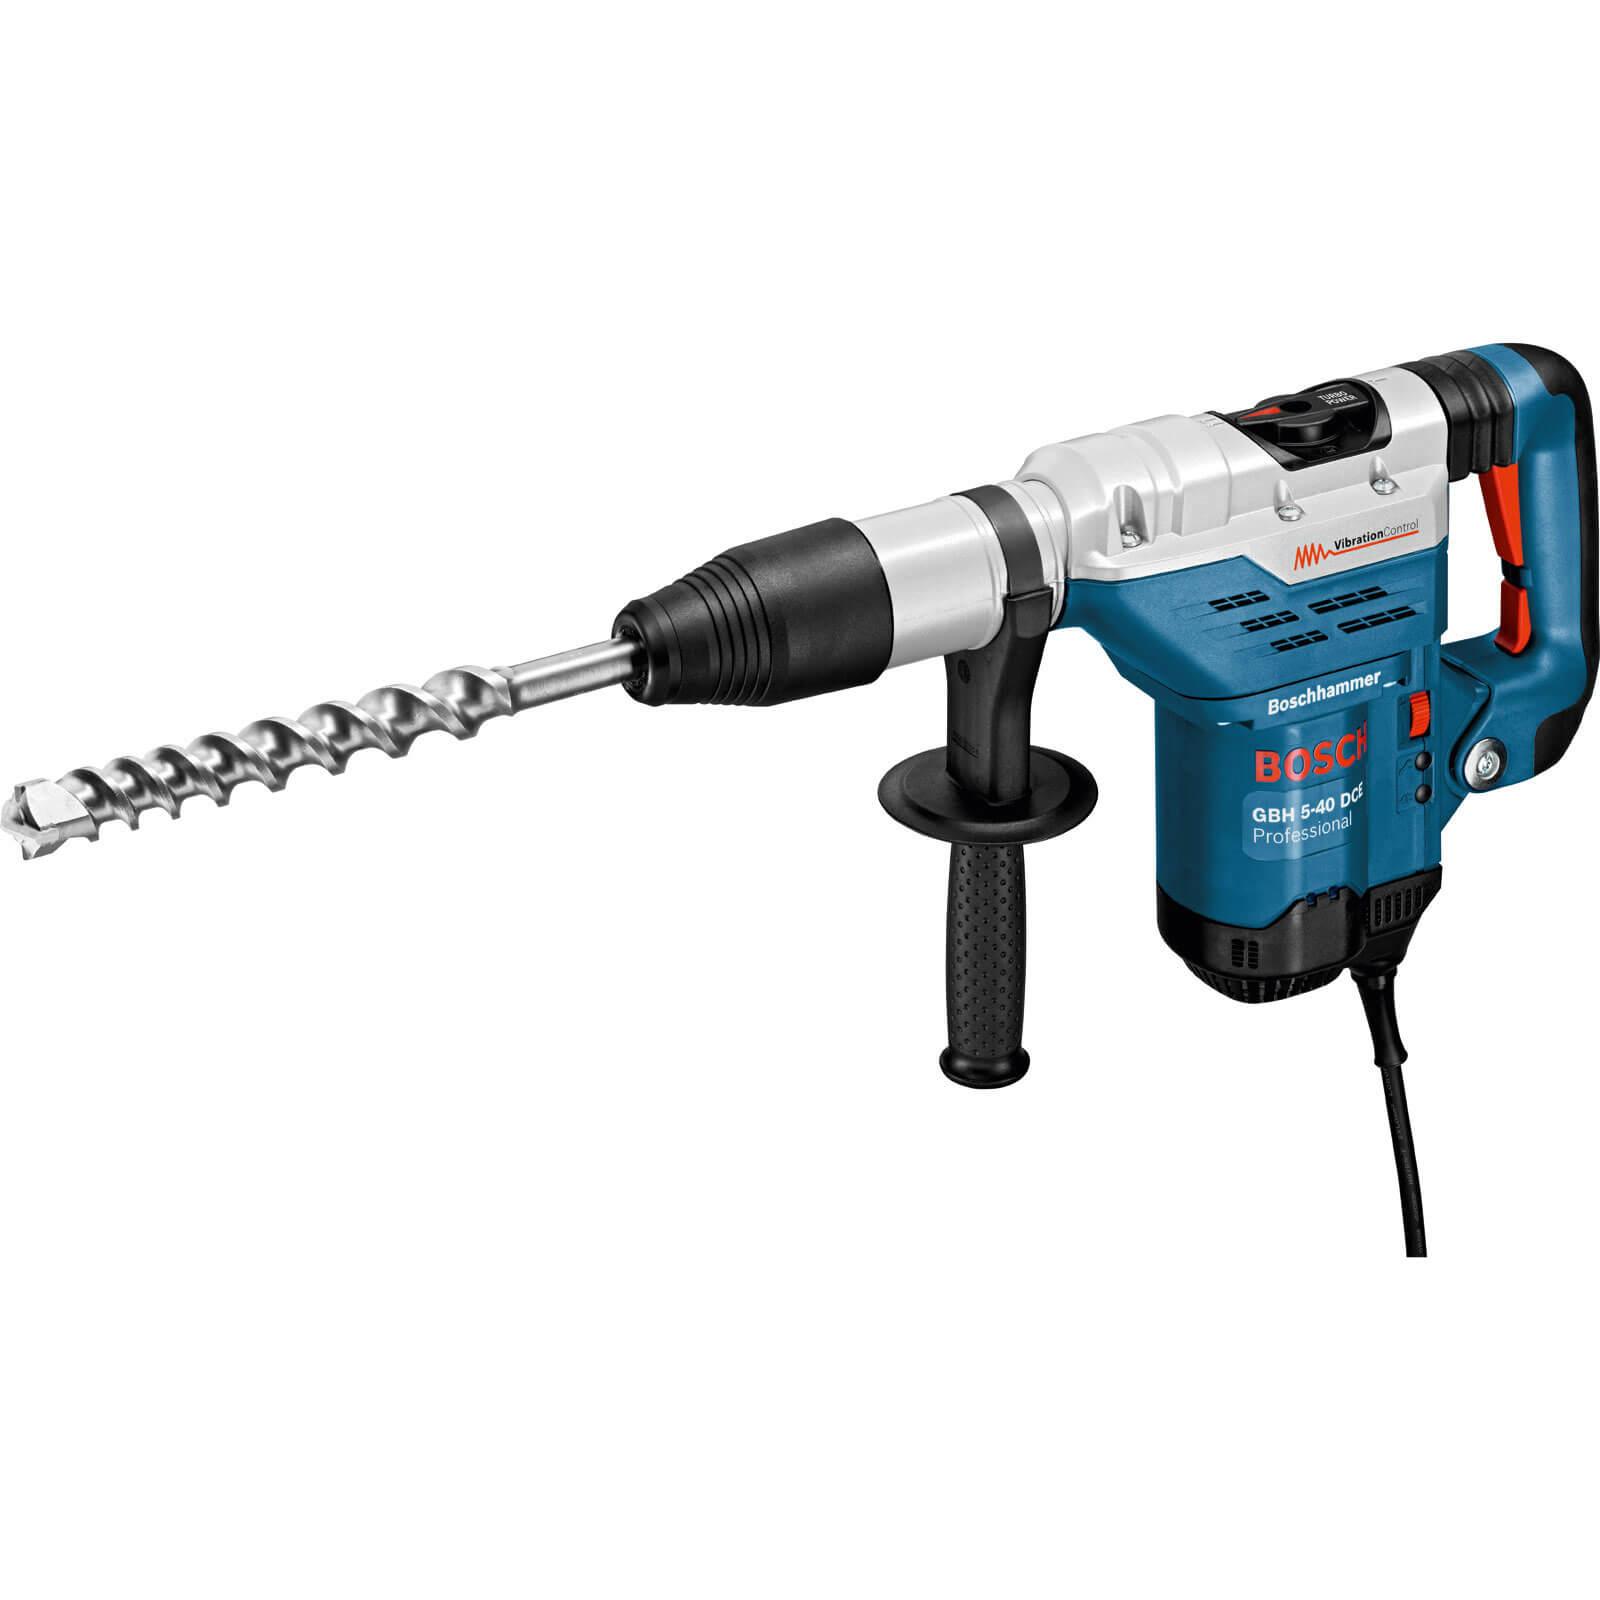 Image of Bosch GBH 5 40 DCE SDS Max Rotary Demolition Hammer 110v